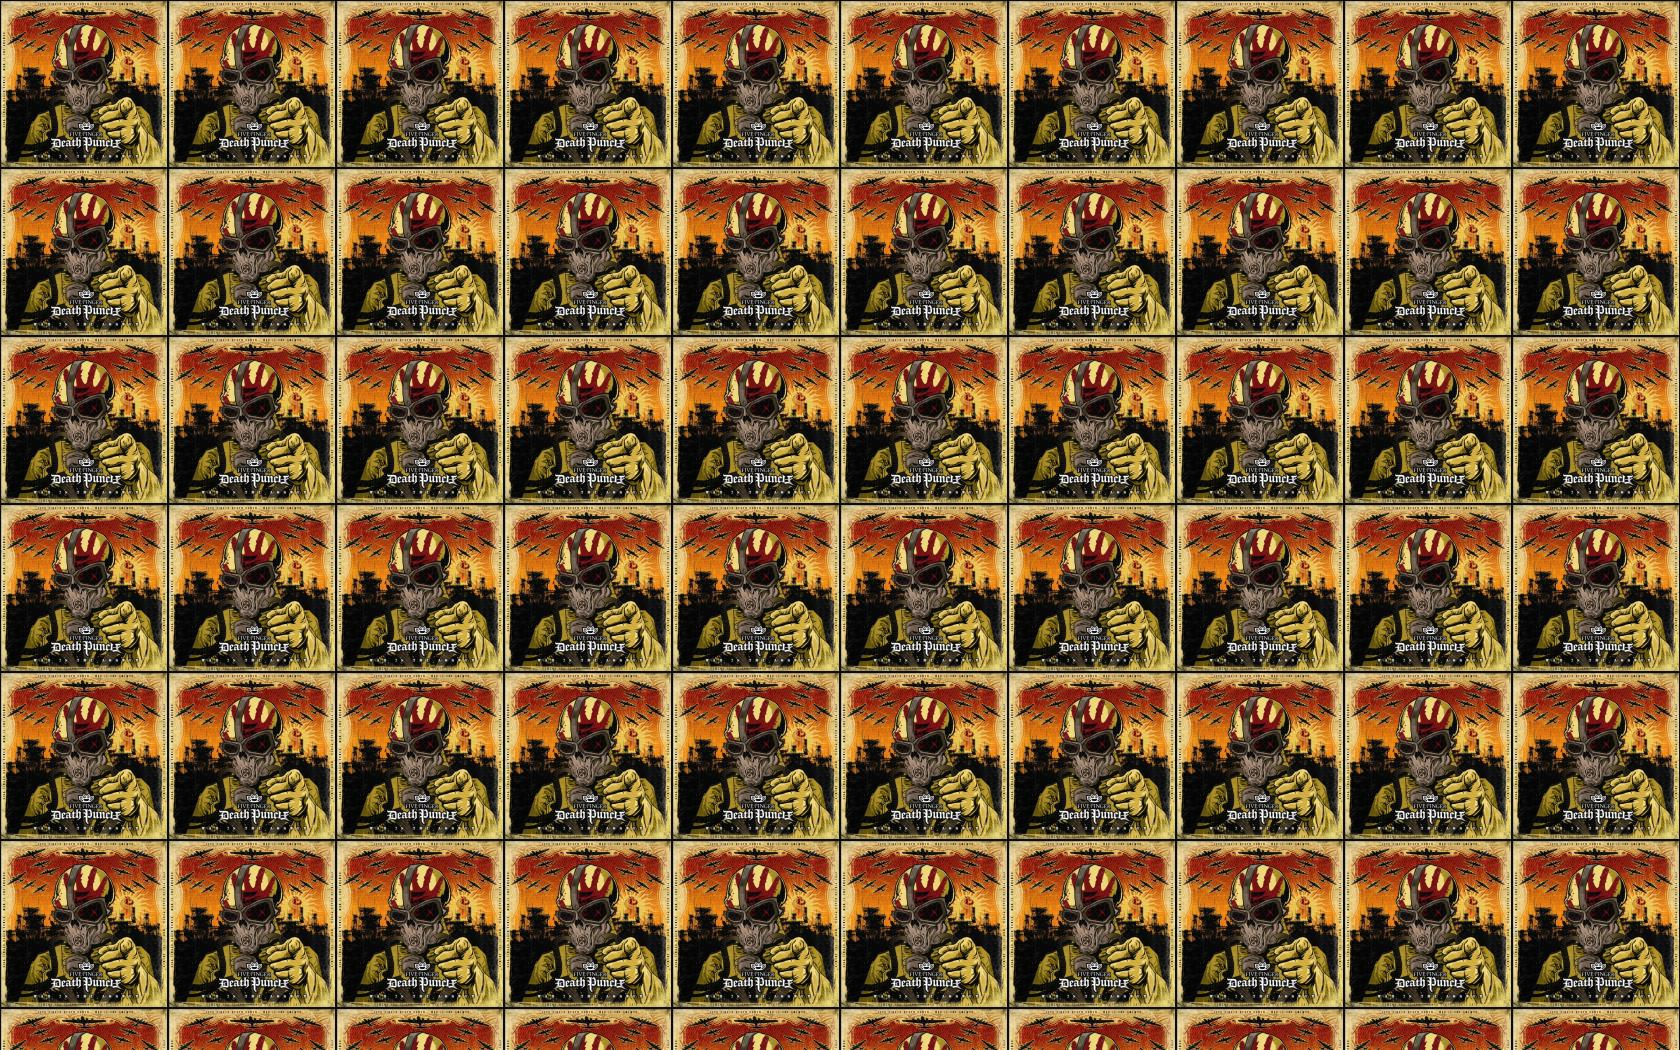 Mortal Kombat Pictures